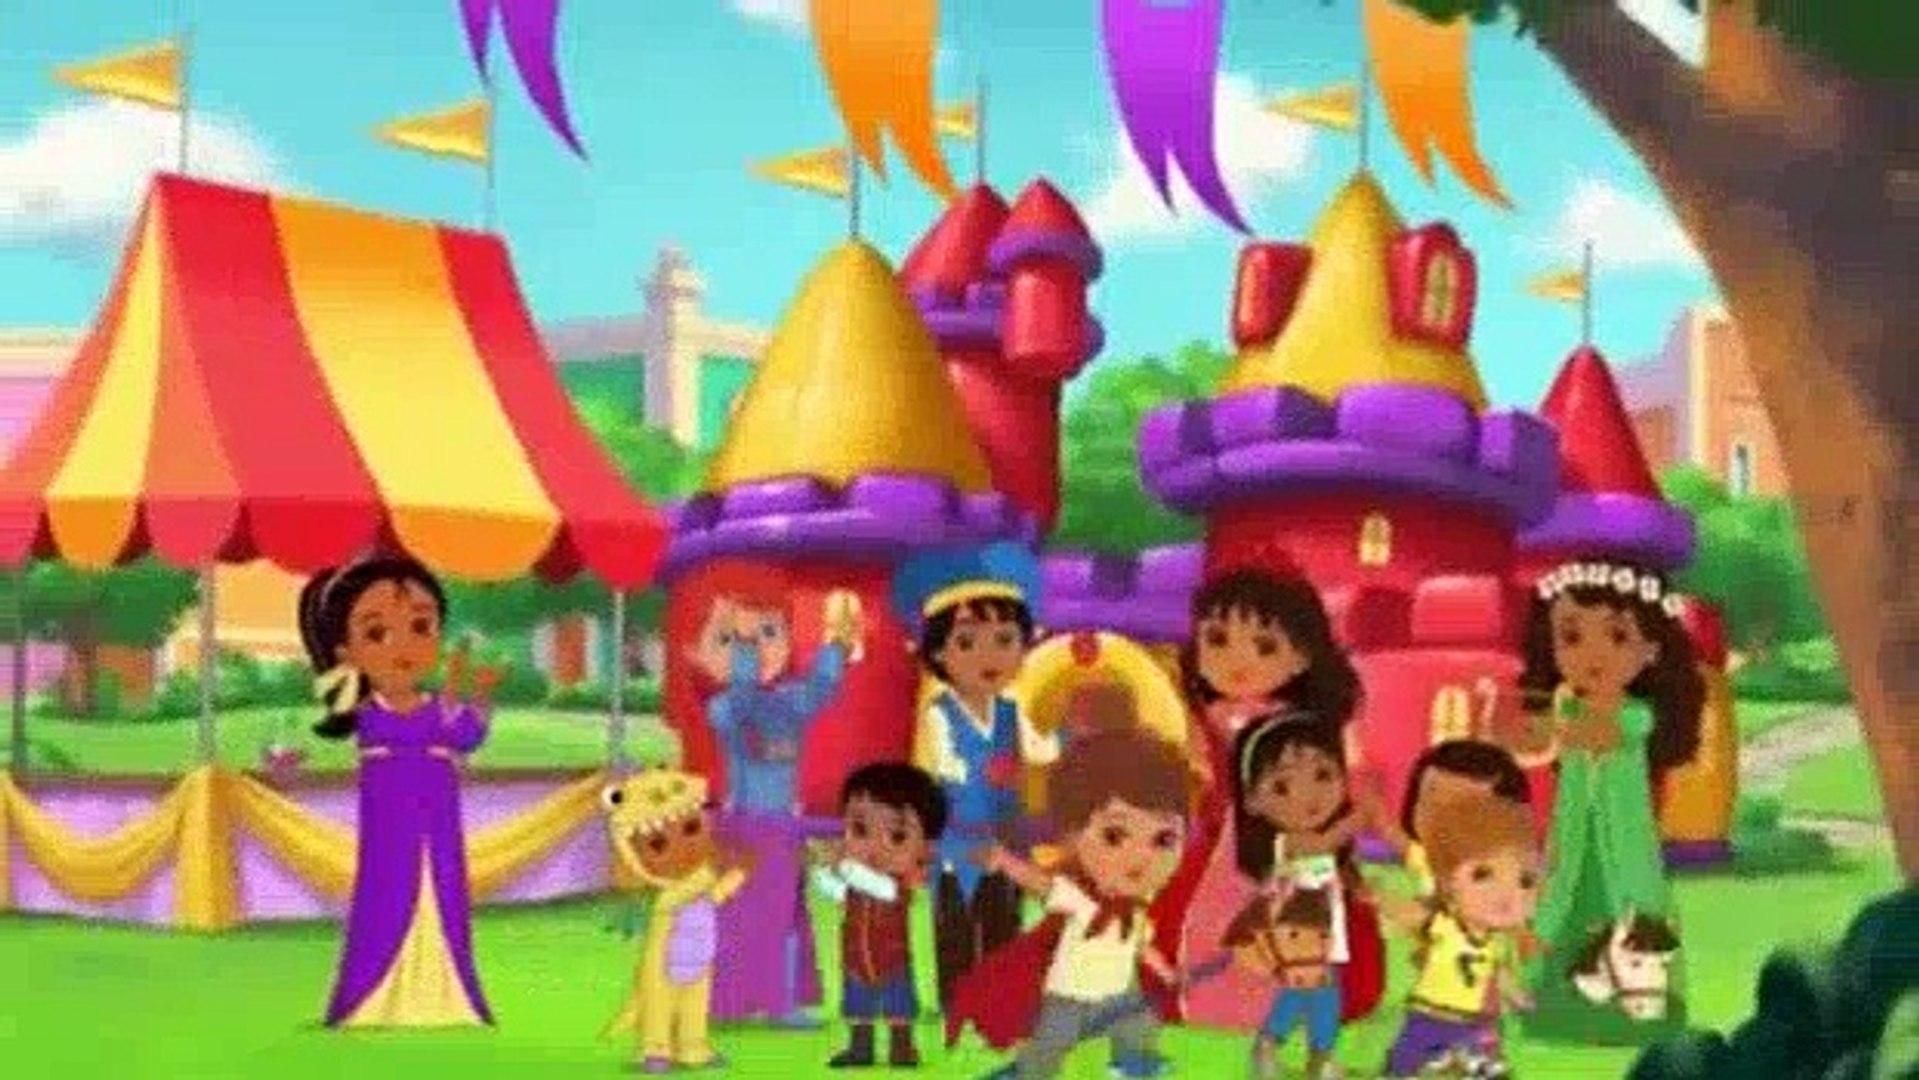 Dora and Friends Into the City! S01E03 - Dance Party